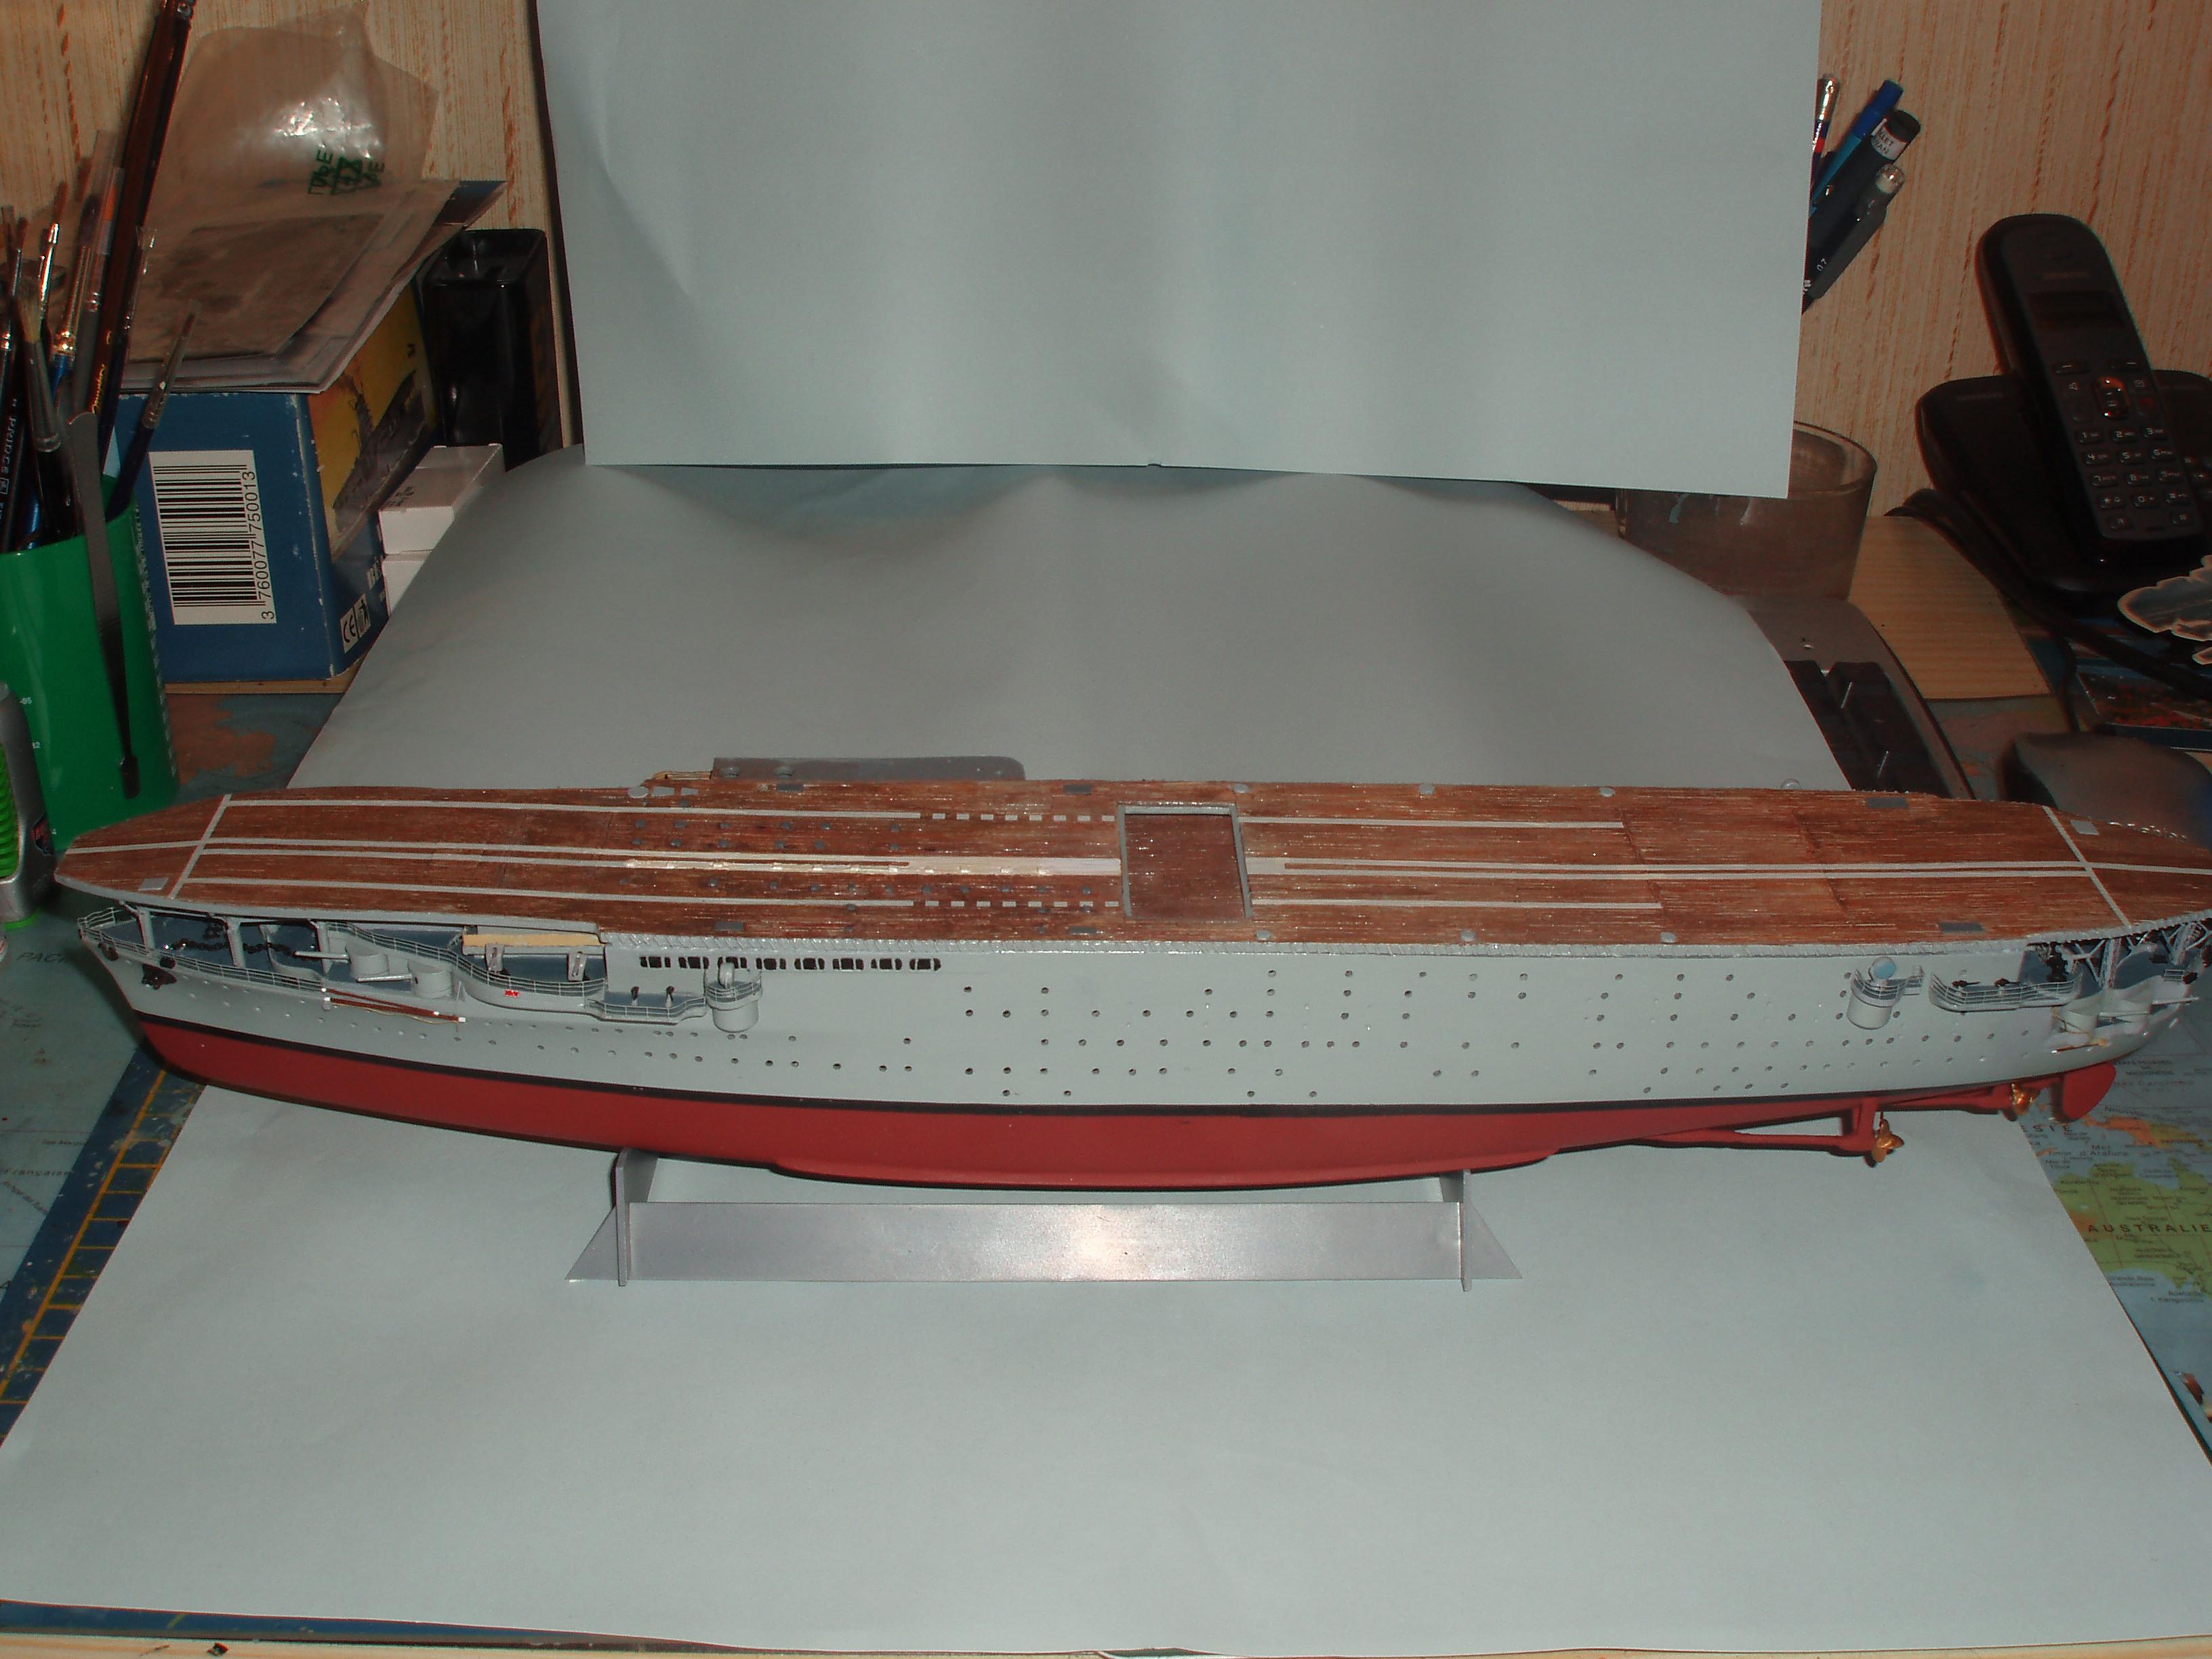 Le porte avions BEARN de l' ARSENAL 537994dio001